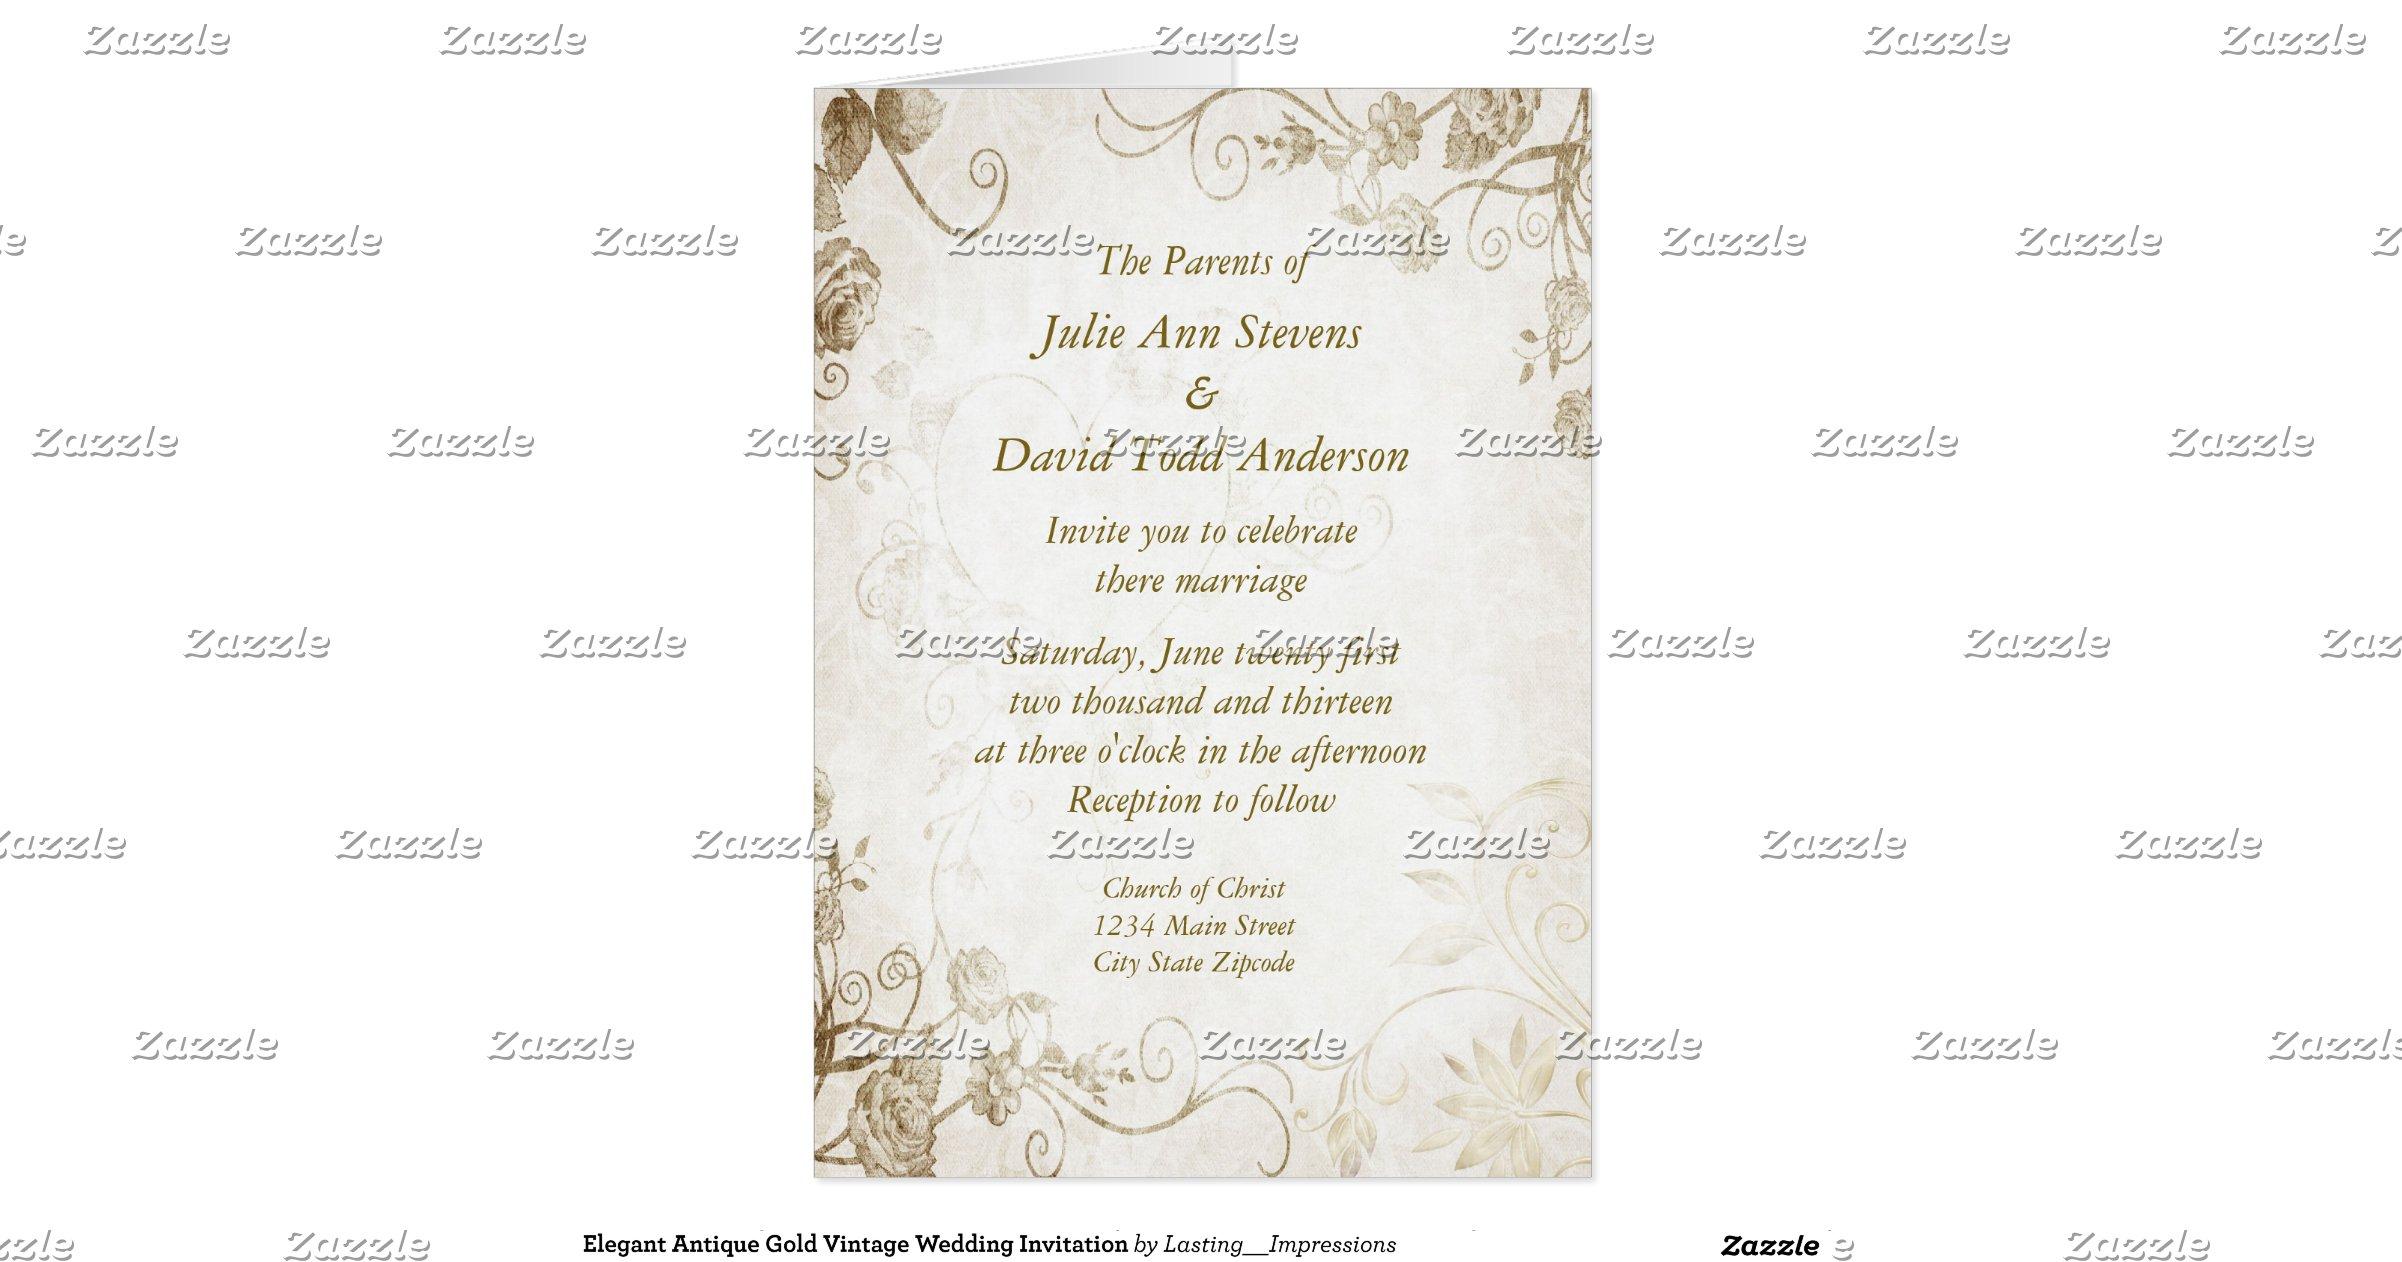 vintage wedding invitations nz - 28 images - vintage rockabilly ...